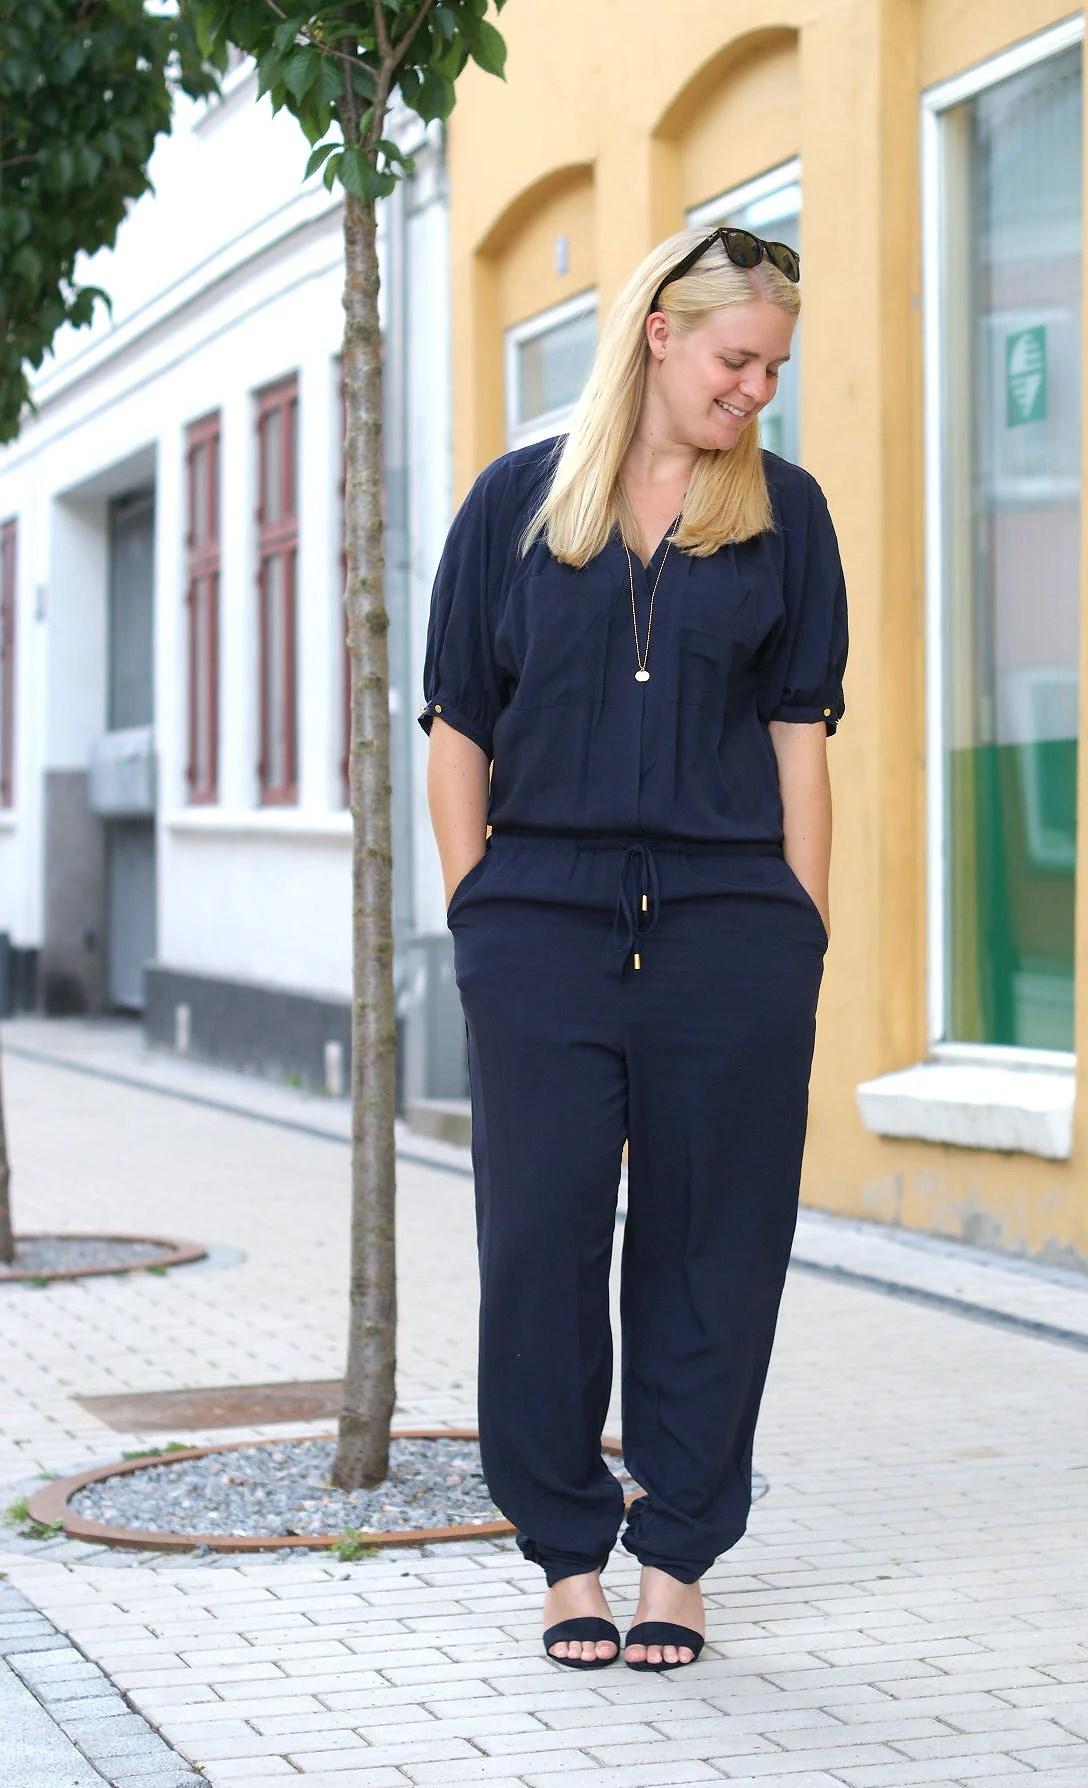 modeblogger-aalborgby-blogger